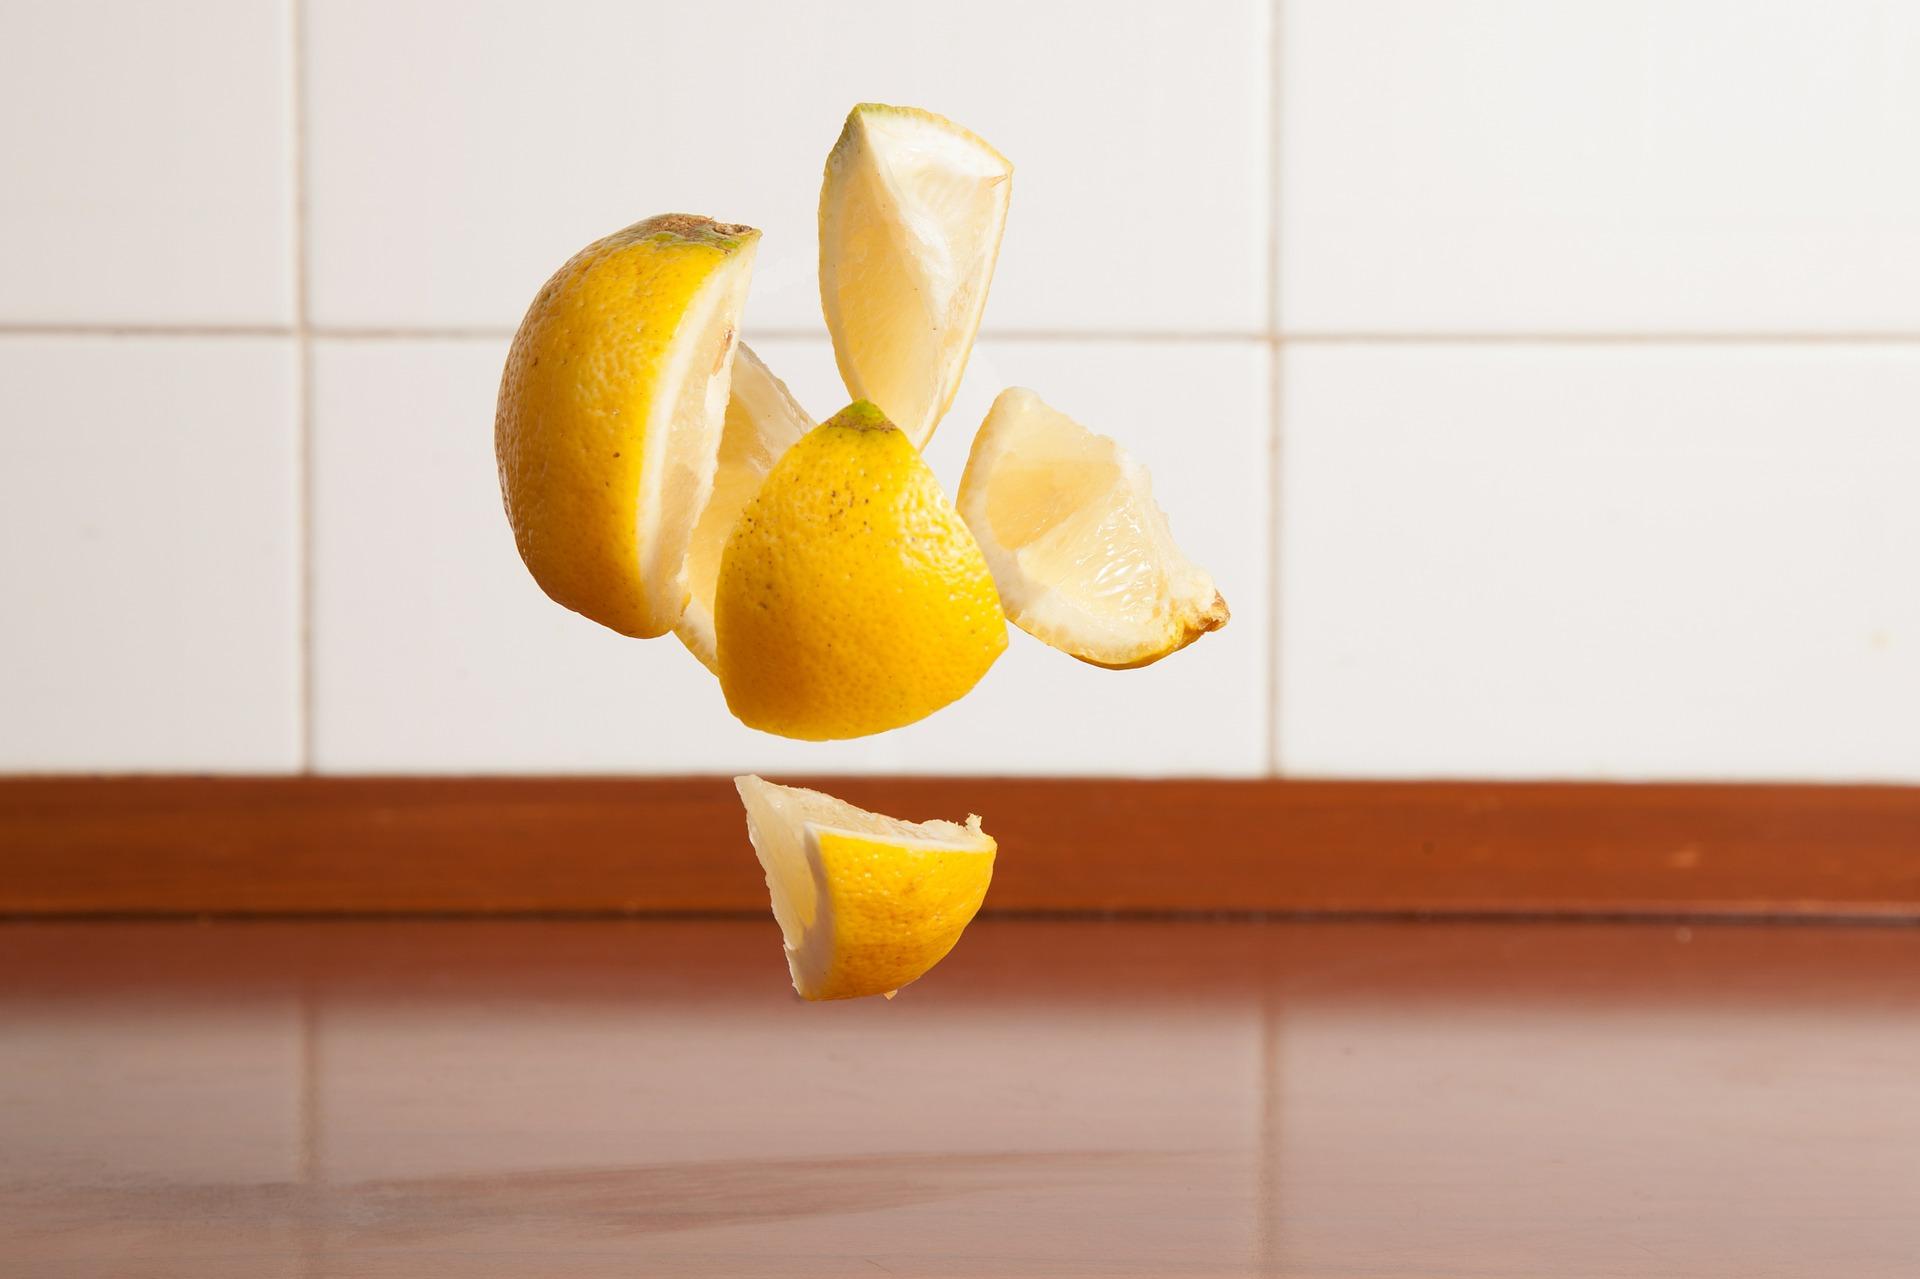 lemon-407173_1920